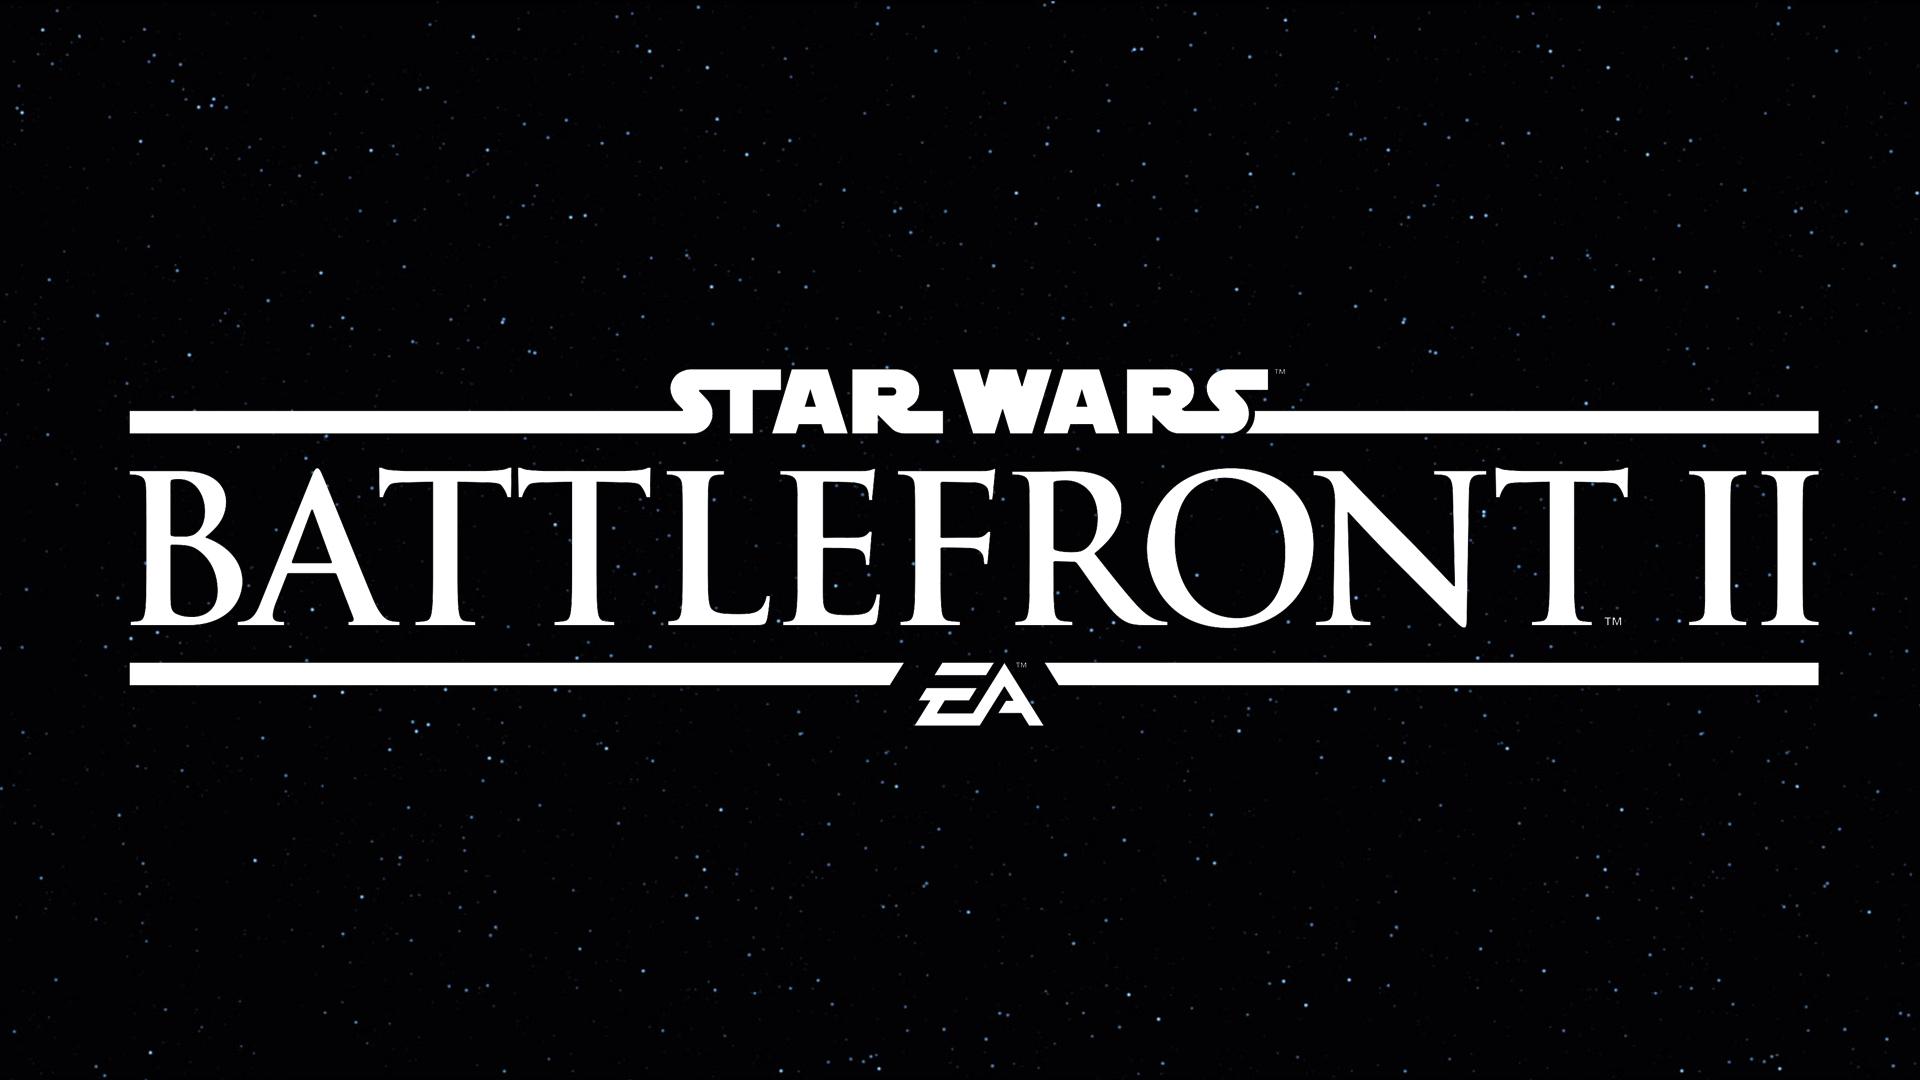 Star Wars: Battlefront 2 (2017) Review